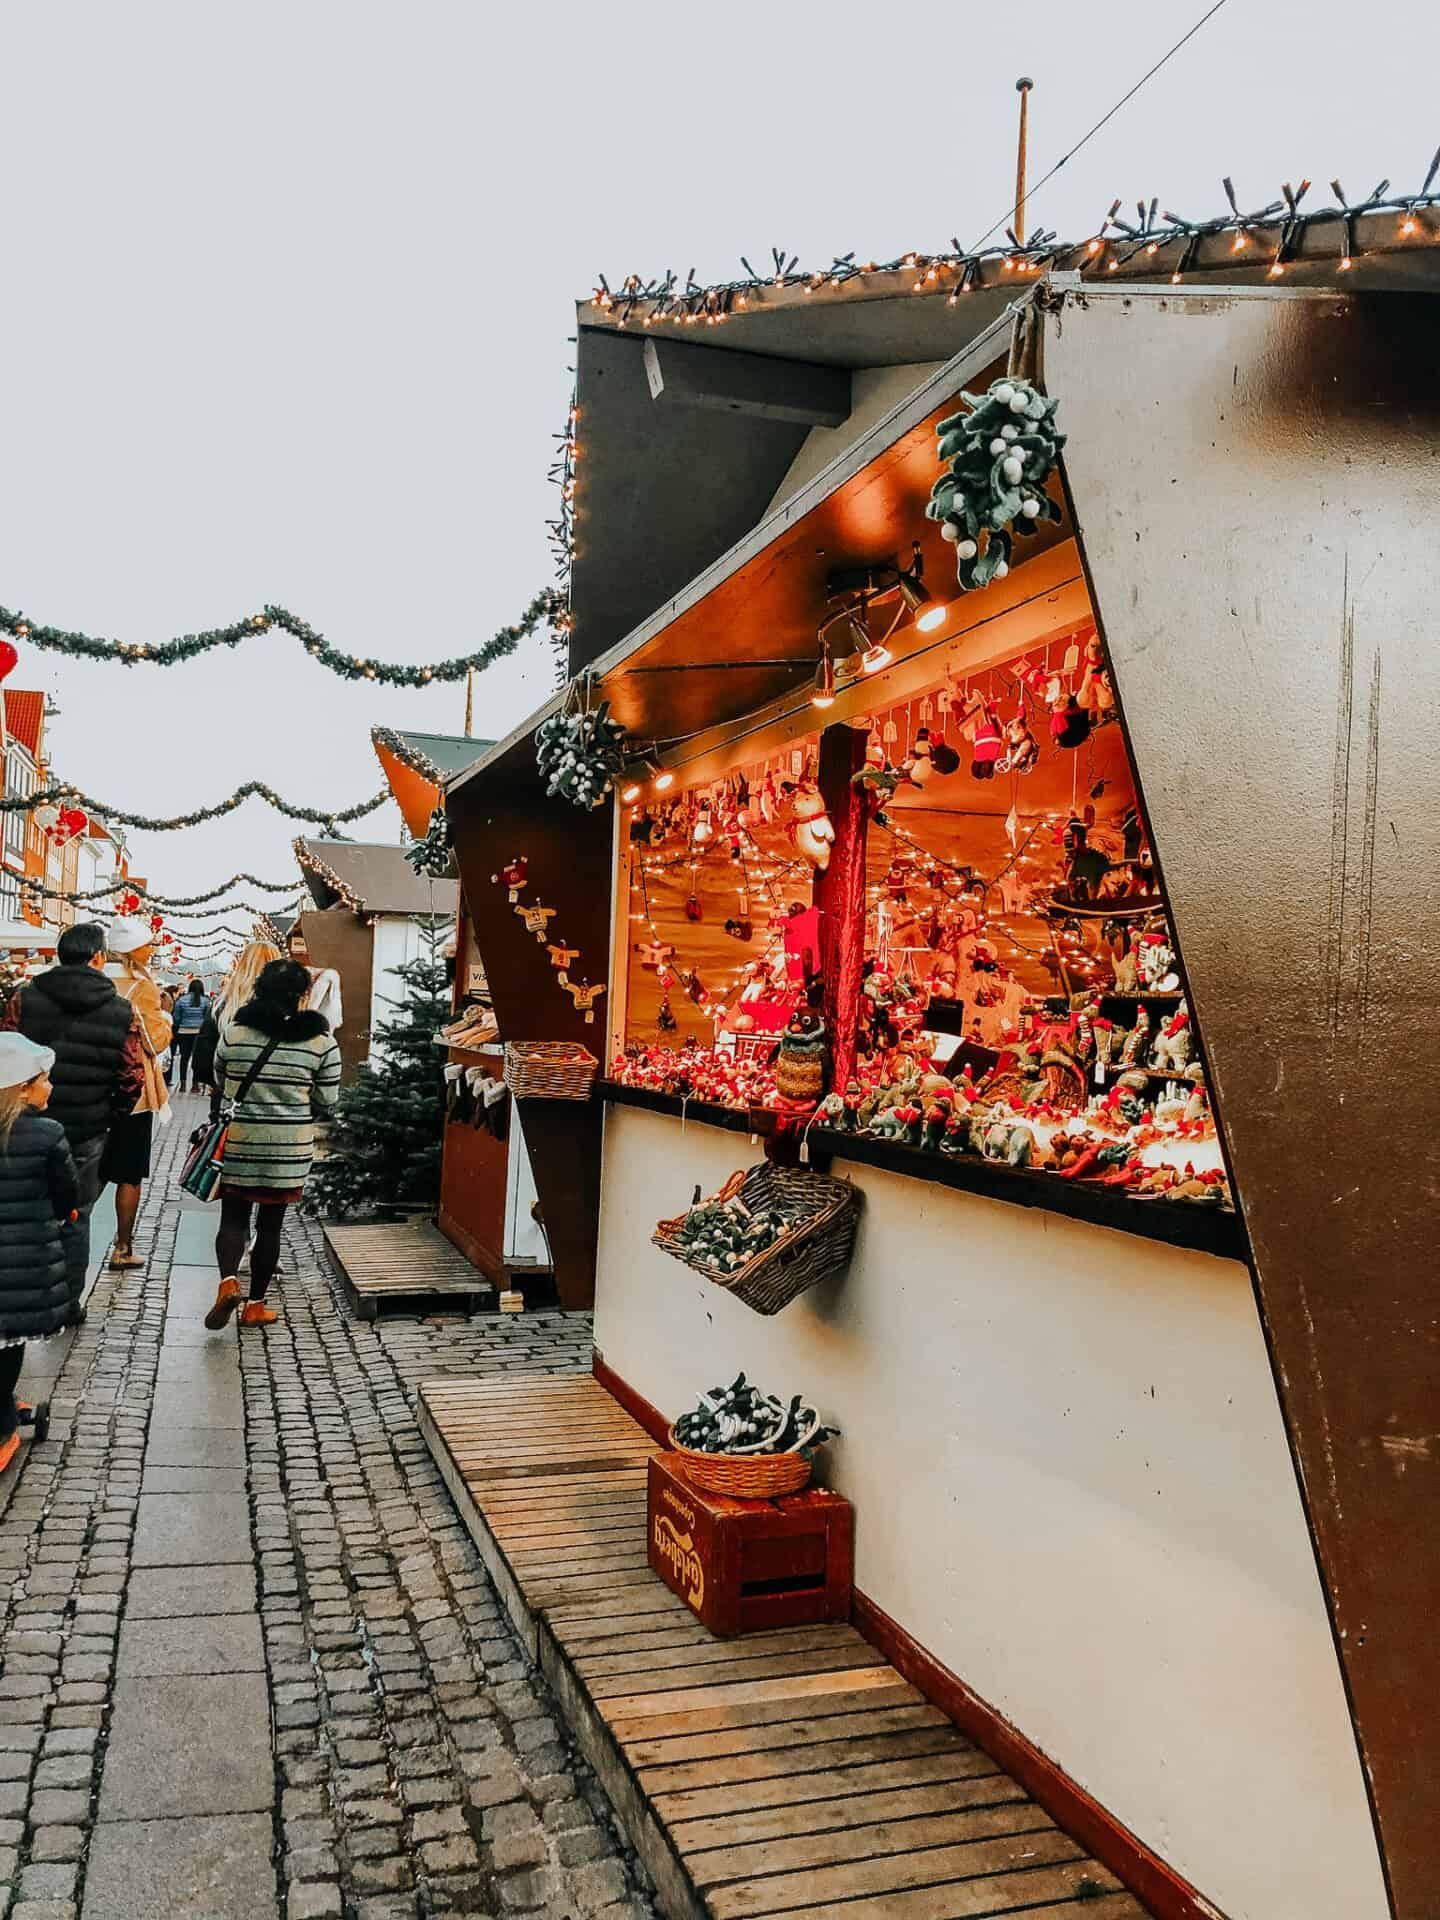 Christmas market hut at sunset